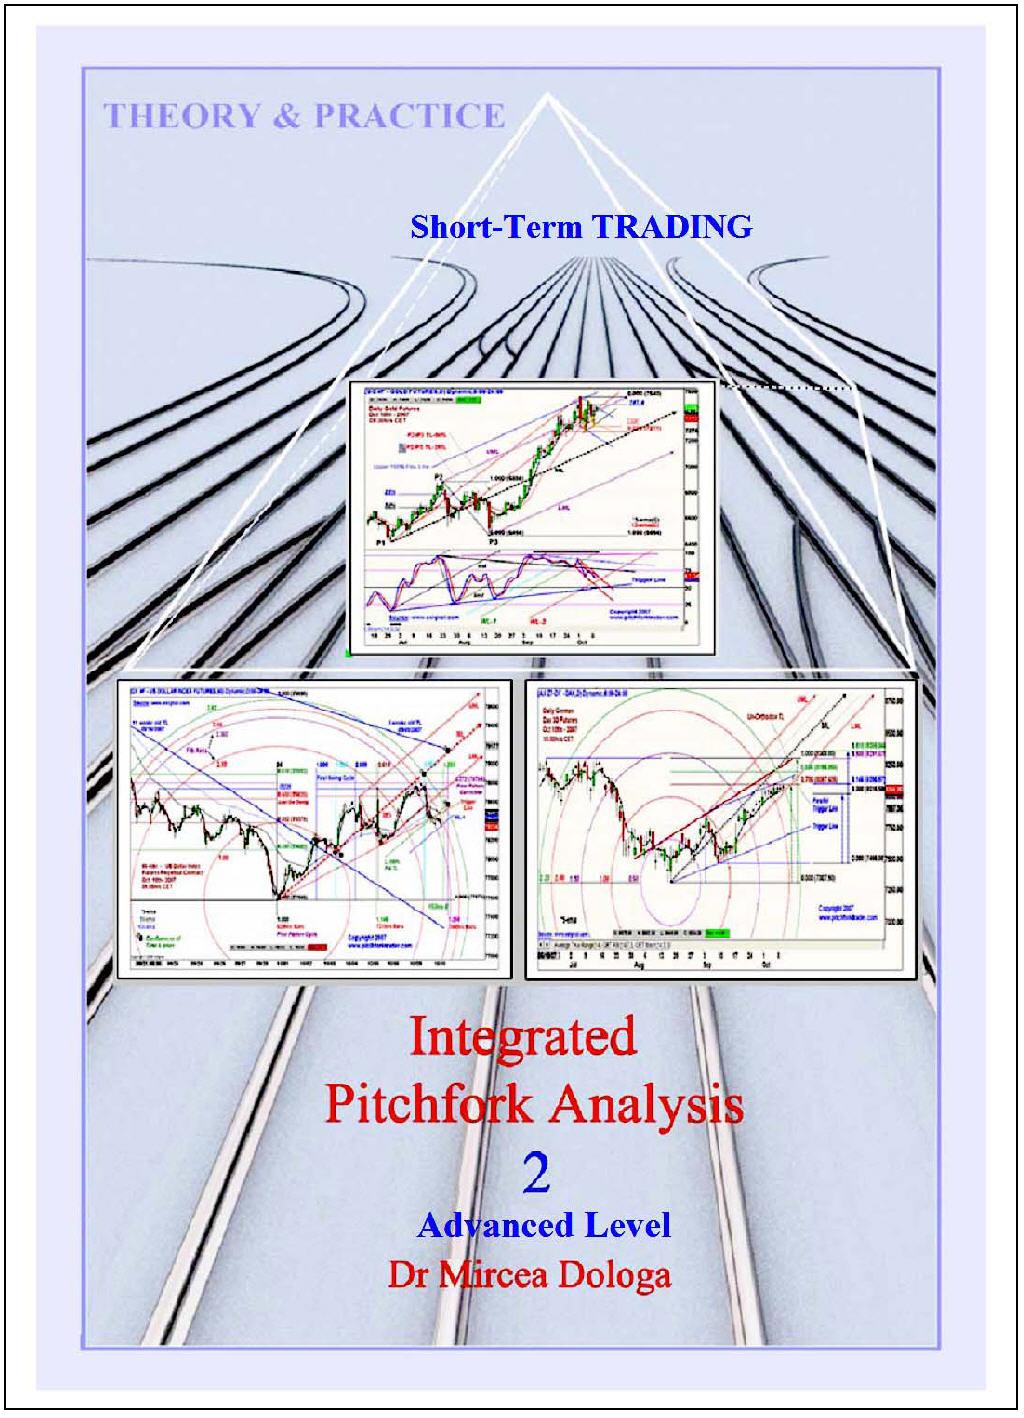 Integrated Pitchfork Analysis – Advanced Level, Volume II